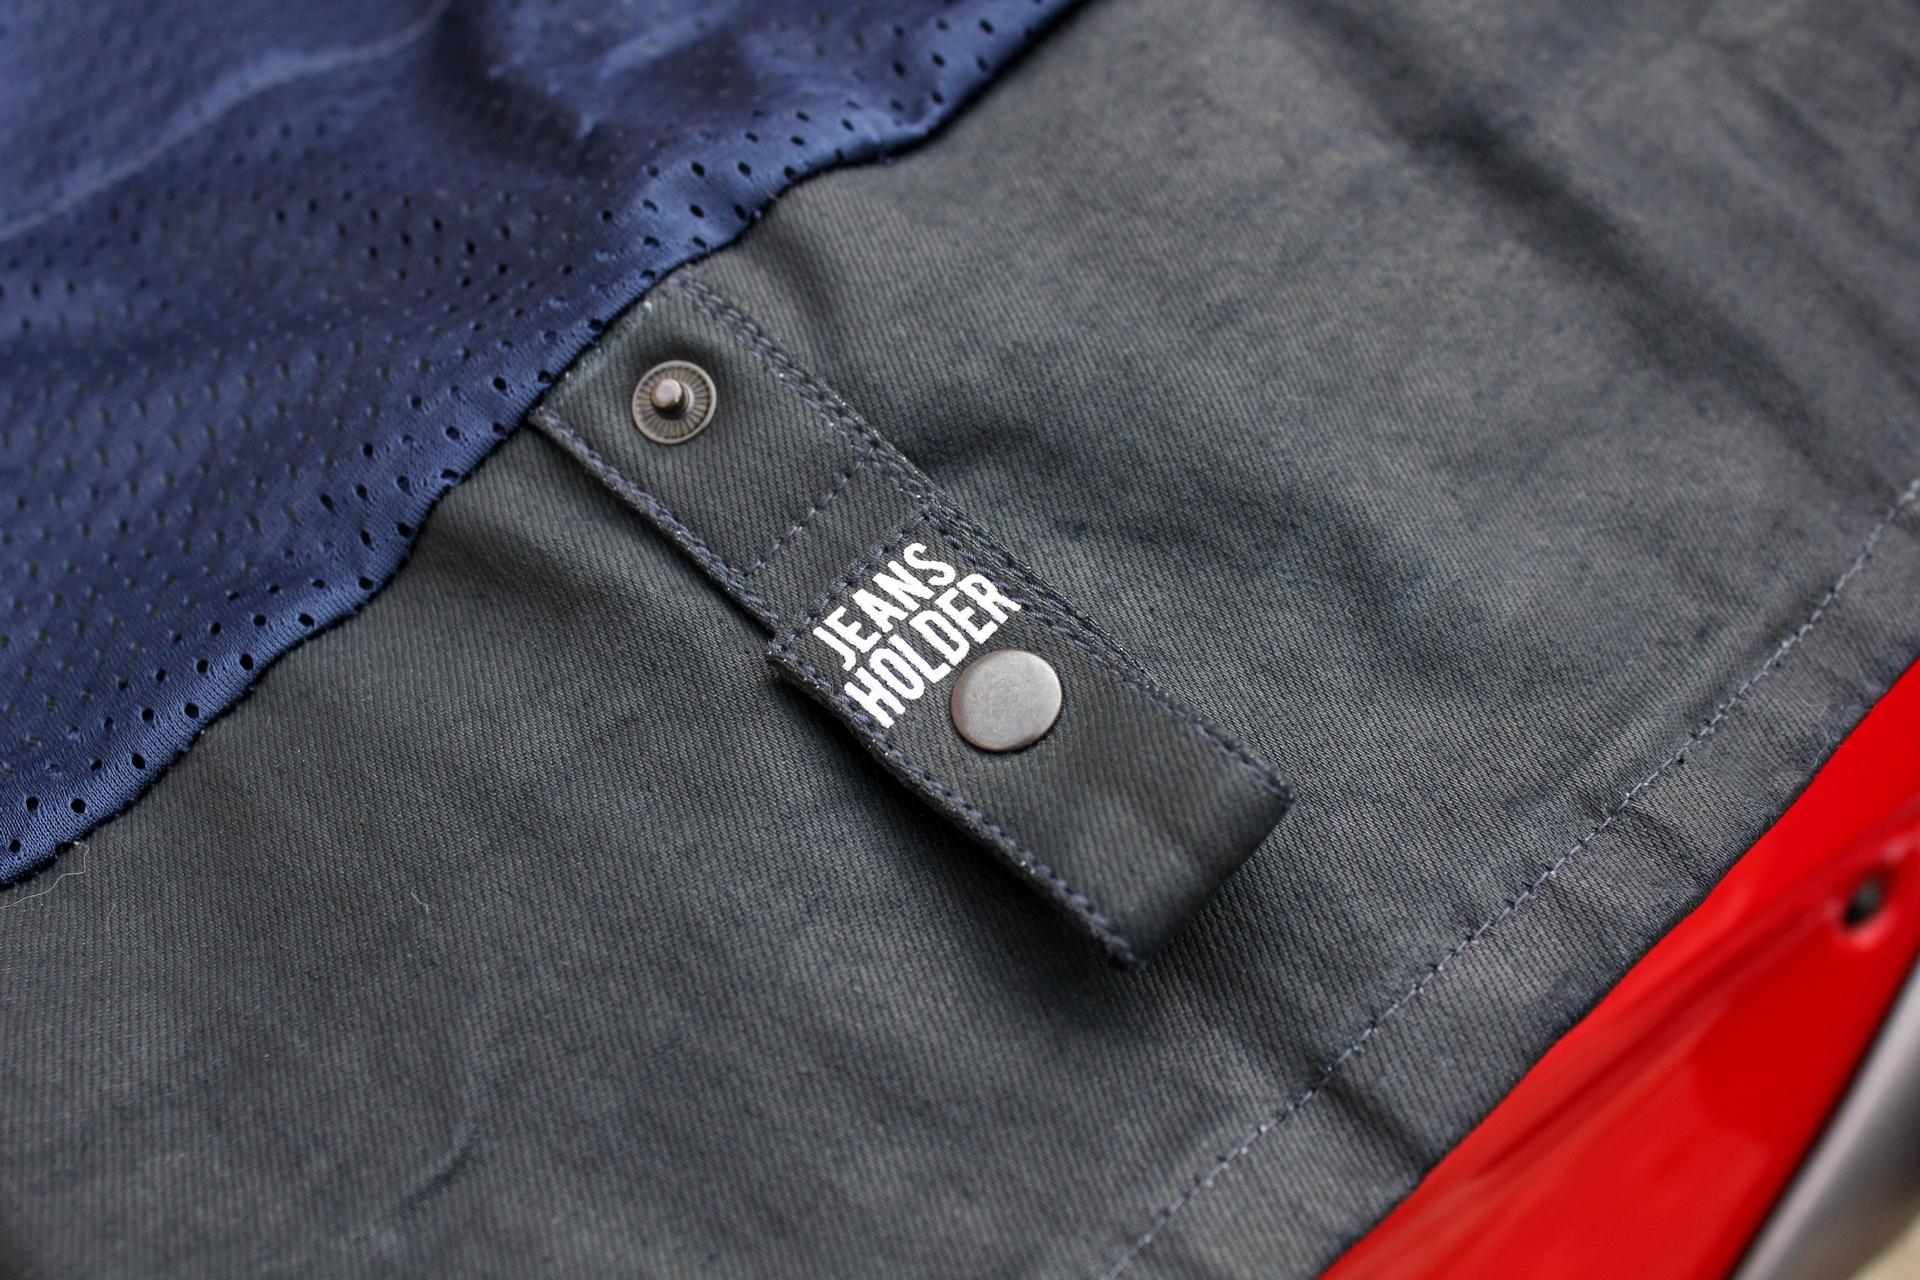 Jeans holder